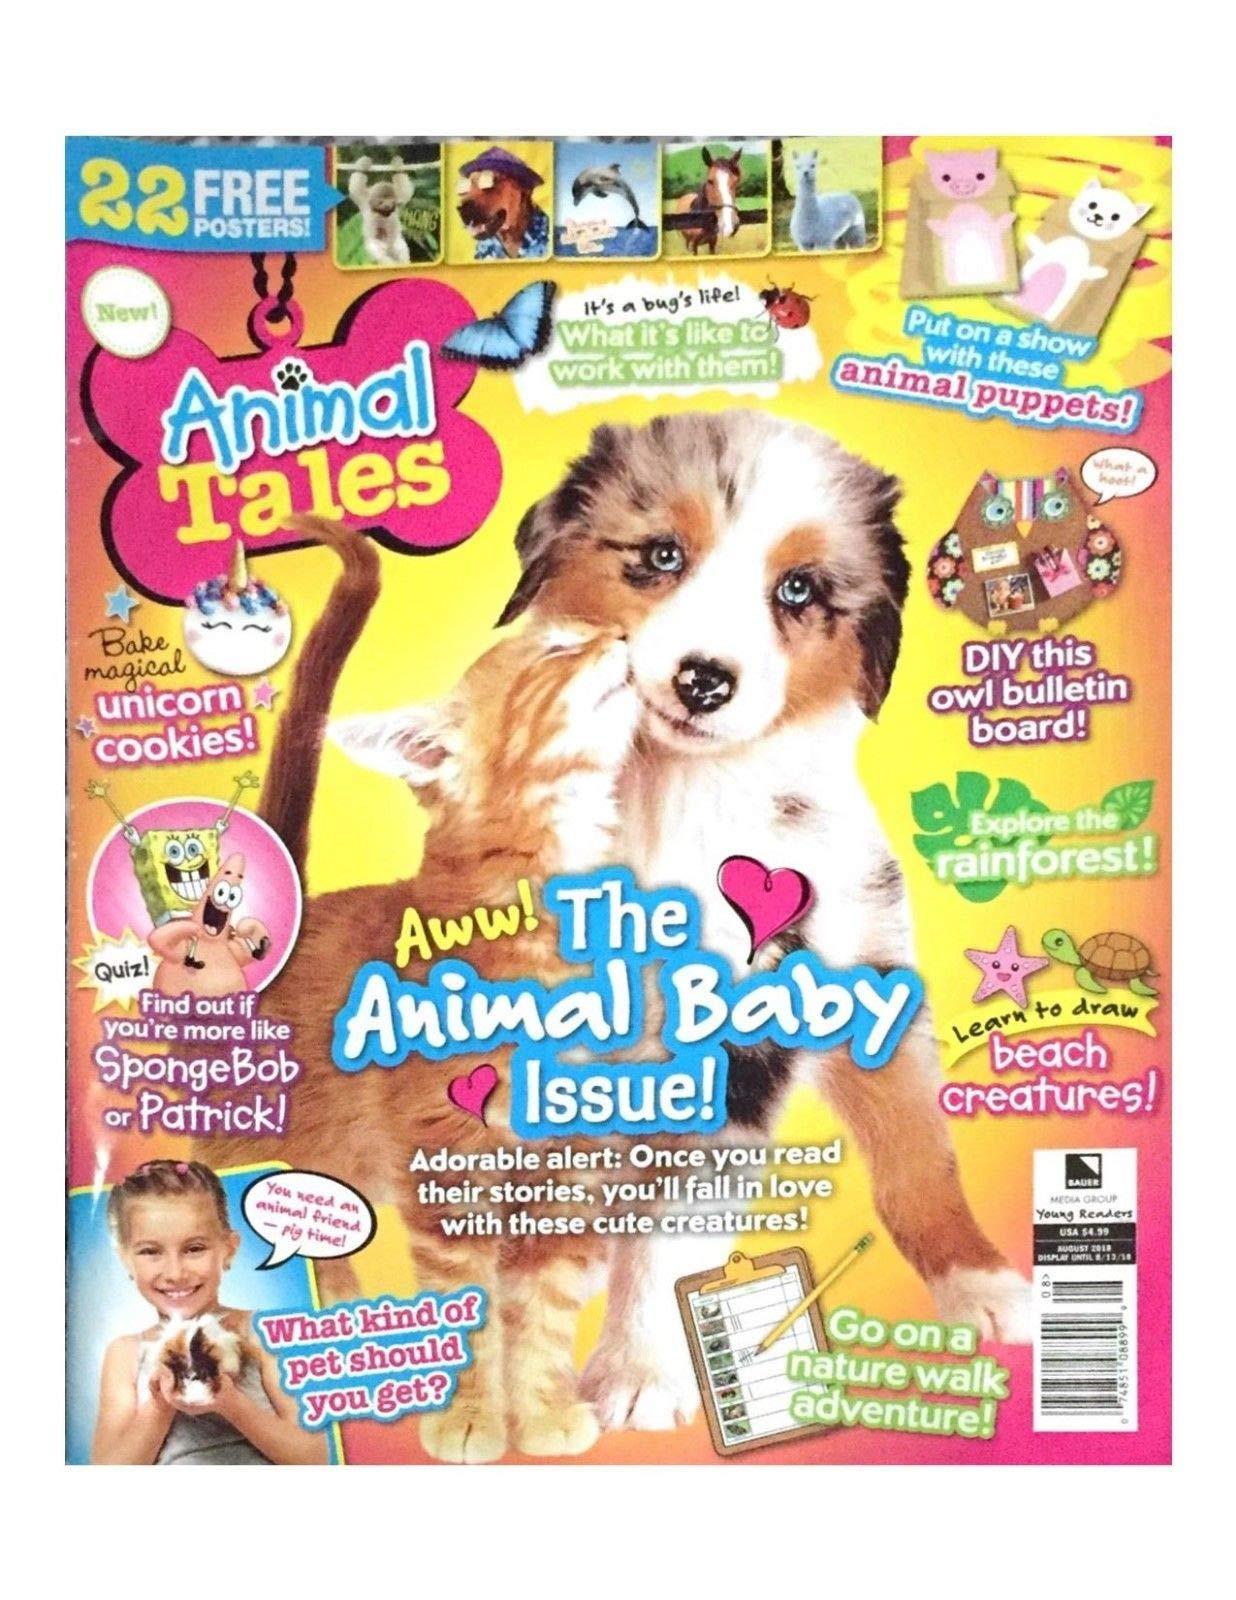 ANIMAL TALES MAGAZINE, AWW! ANIMAL BABY ISSUE